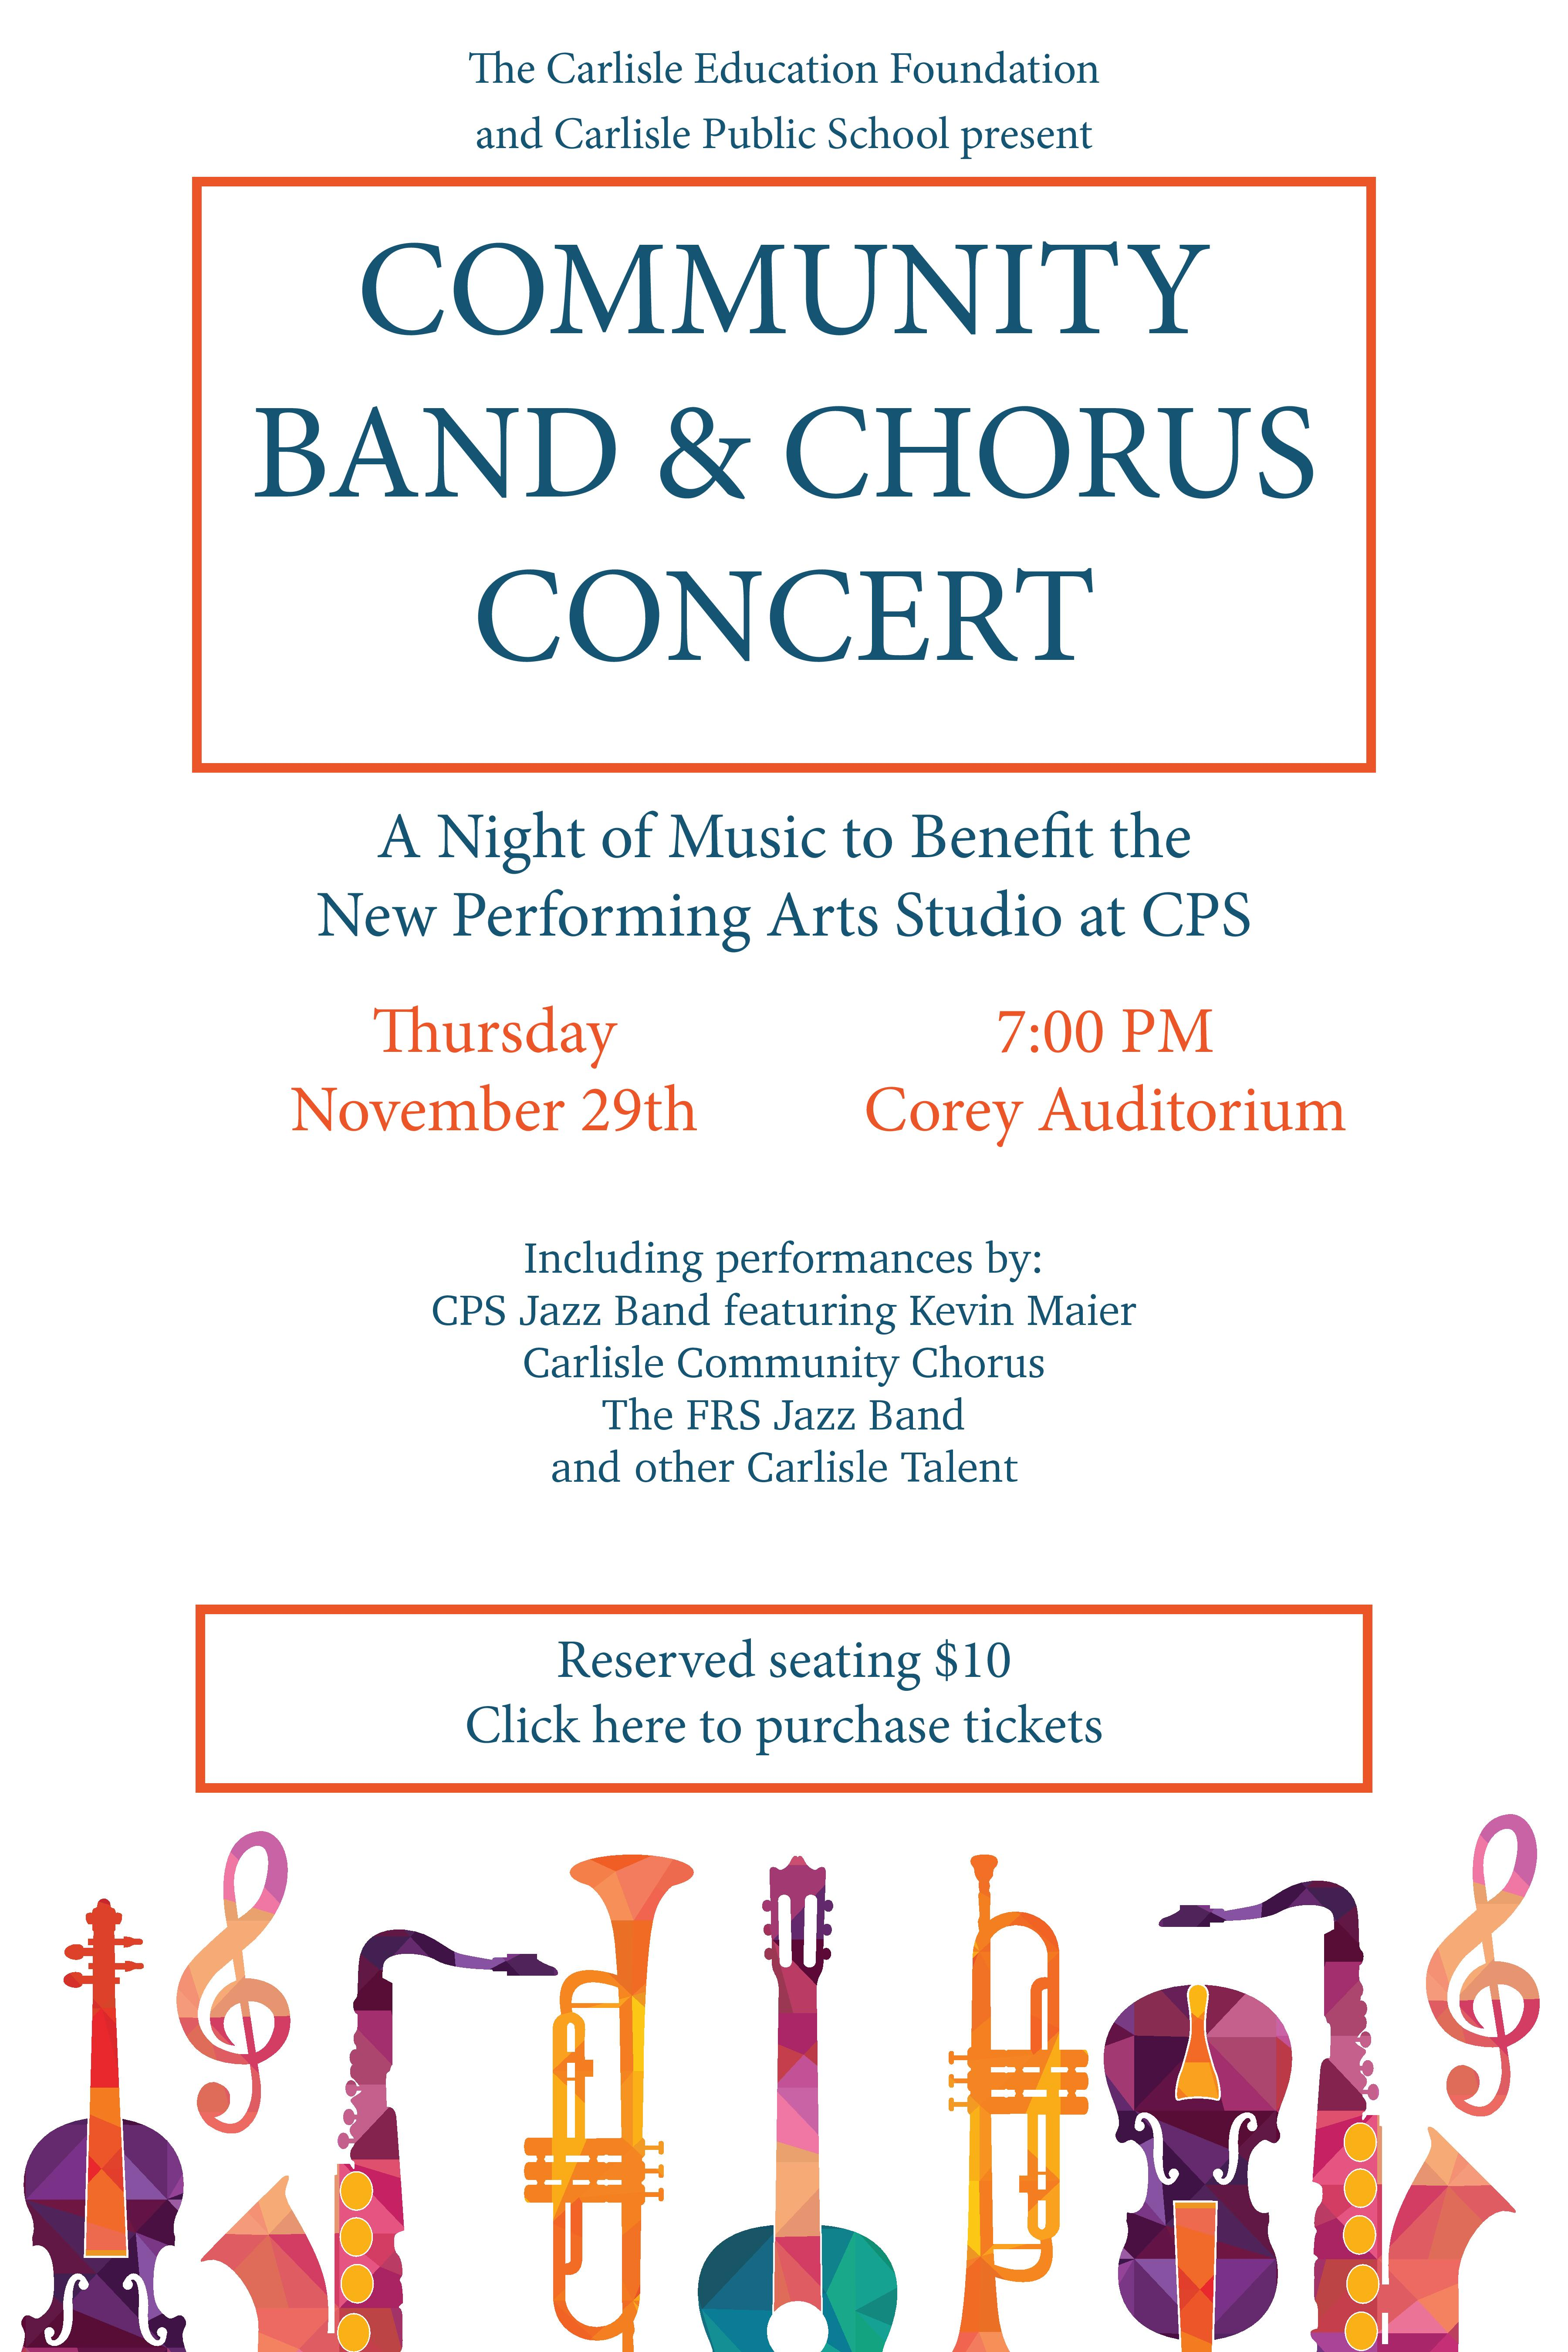 Community Band & Chorus Benefit Concert